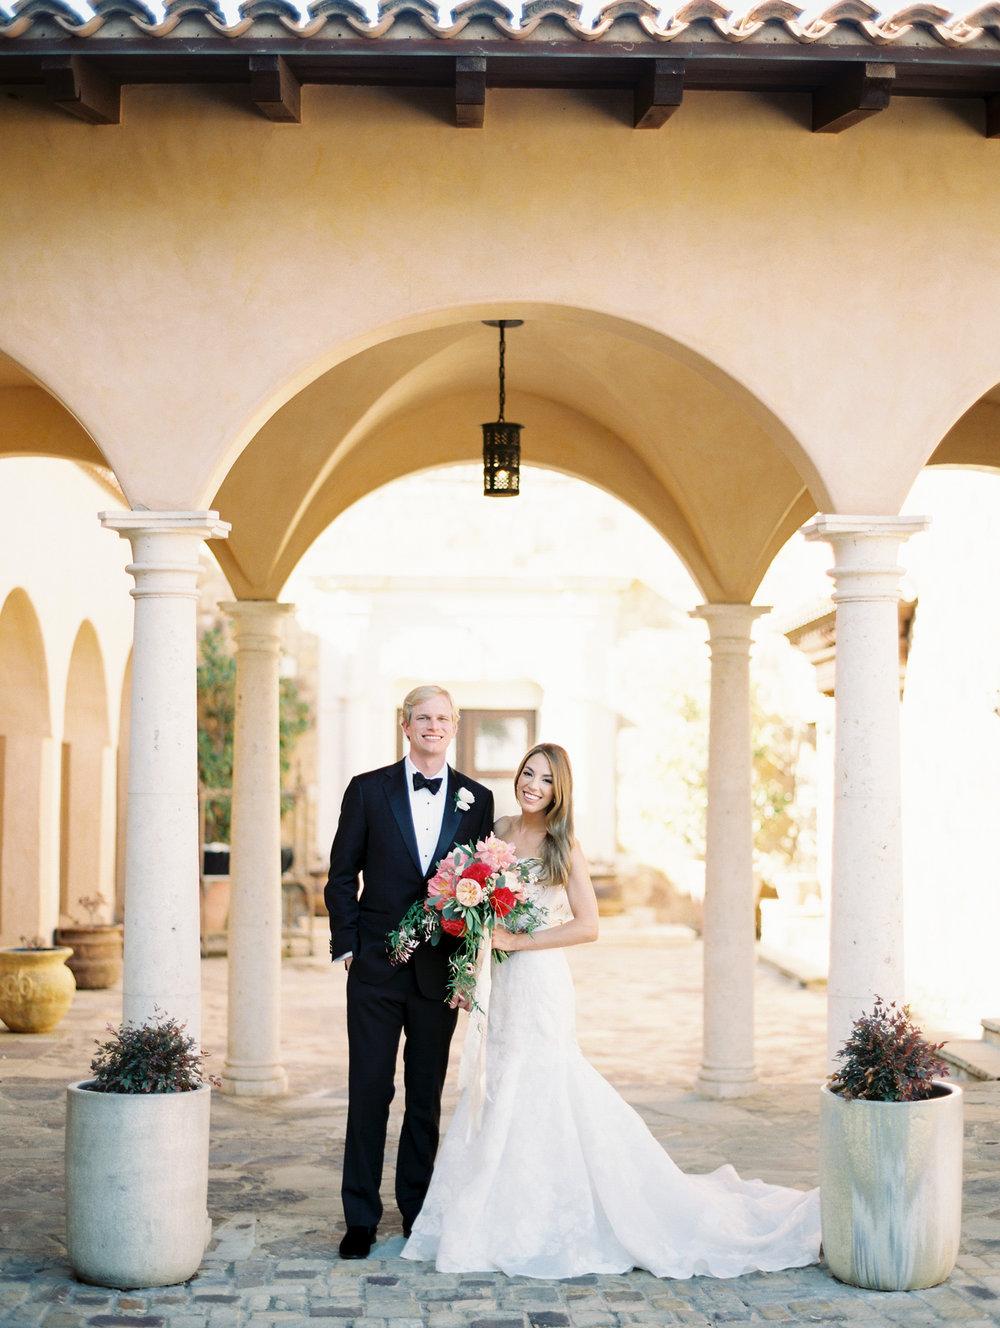 Escondido-Golf_Lake-Club-Hill-Country-Houston-Wedding-Photographer-Best-Top-Luxury-Destination-Engagements-Portrait-Austin-Photography-1.jpg